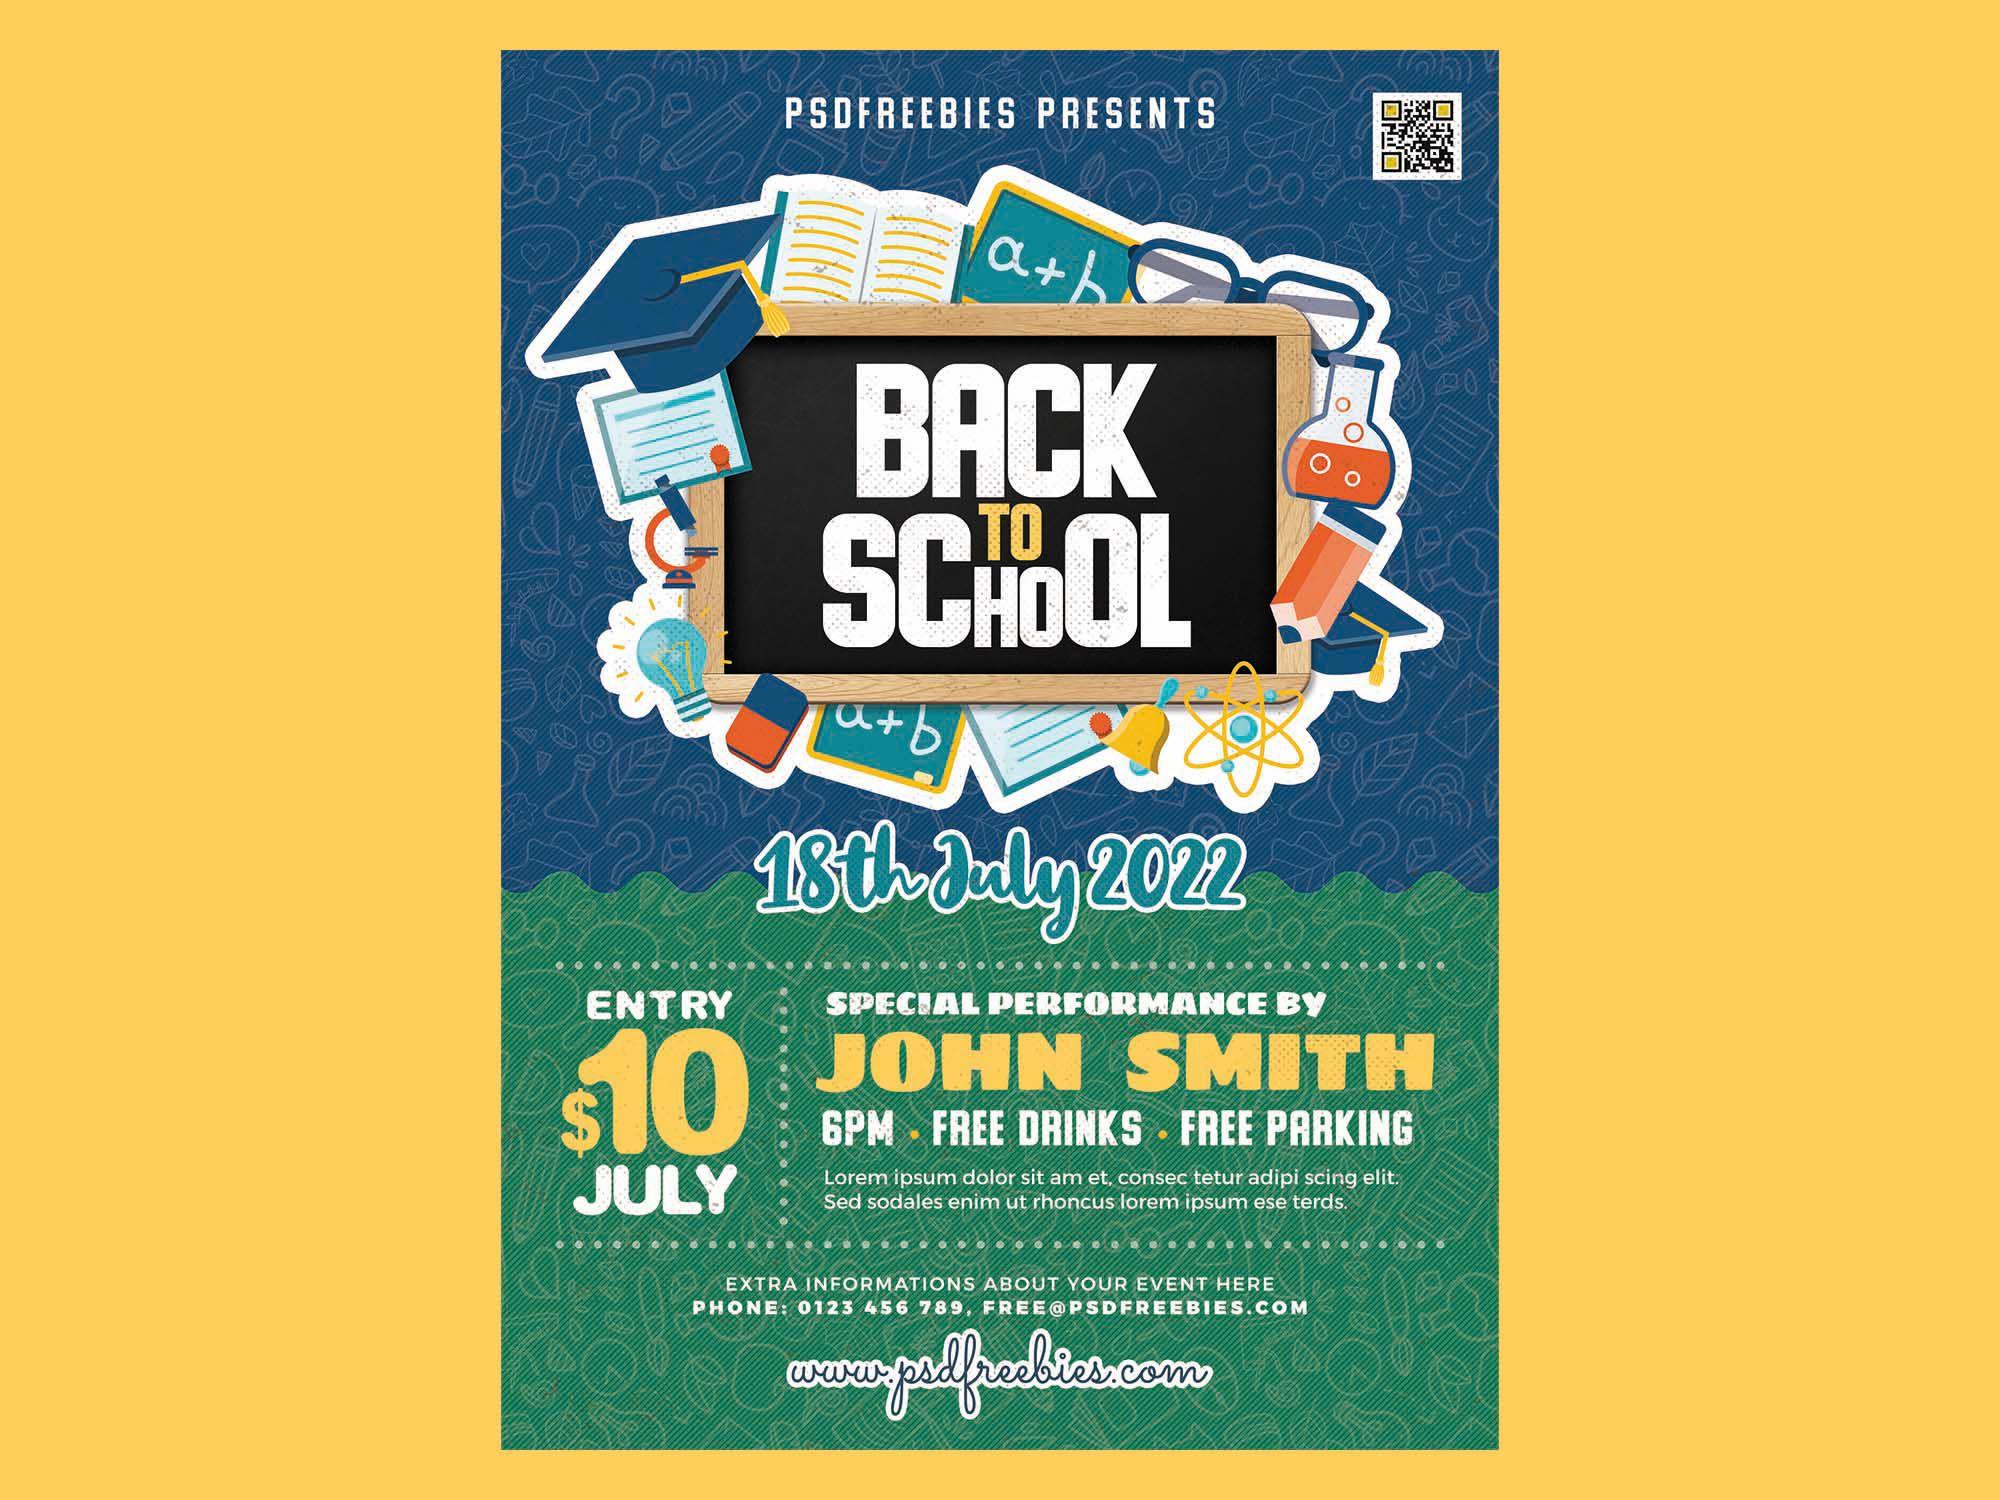 005 Top Free School Event Flyer Template High Def  TemplatesFull